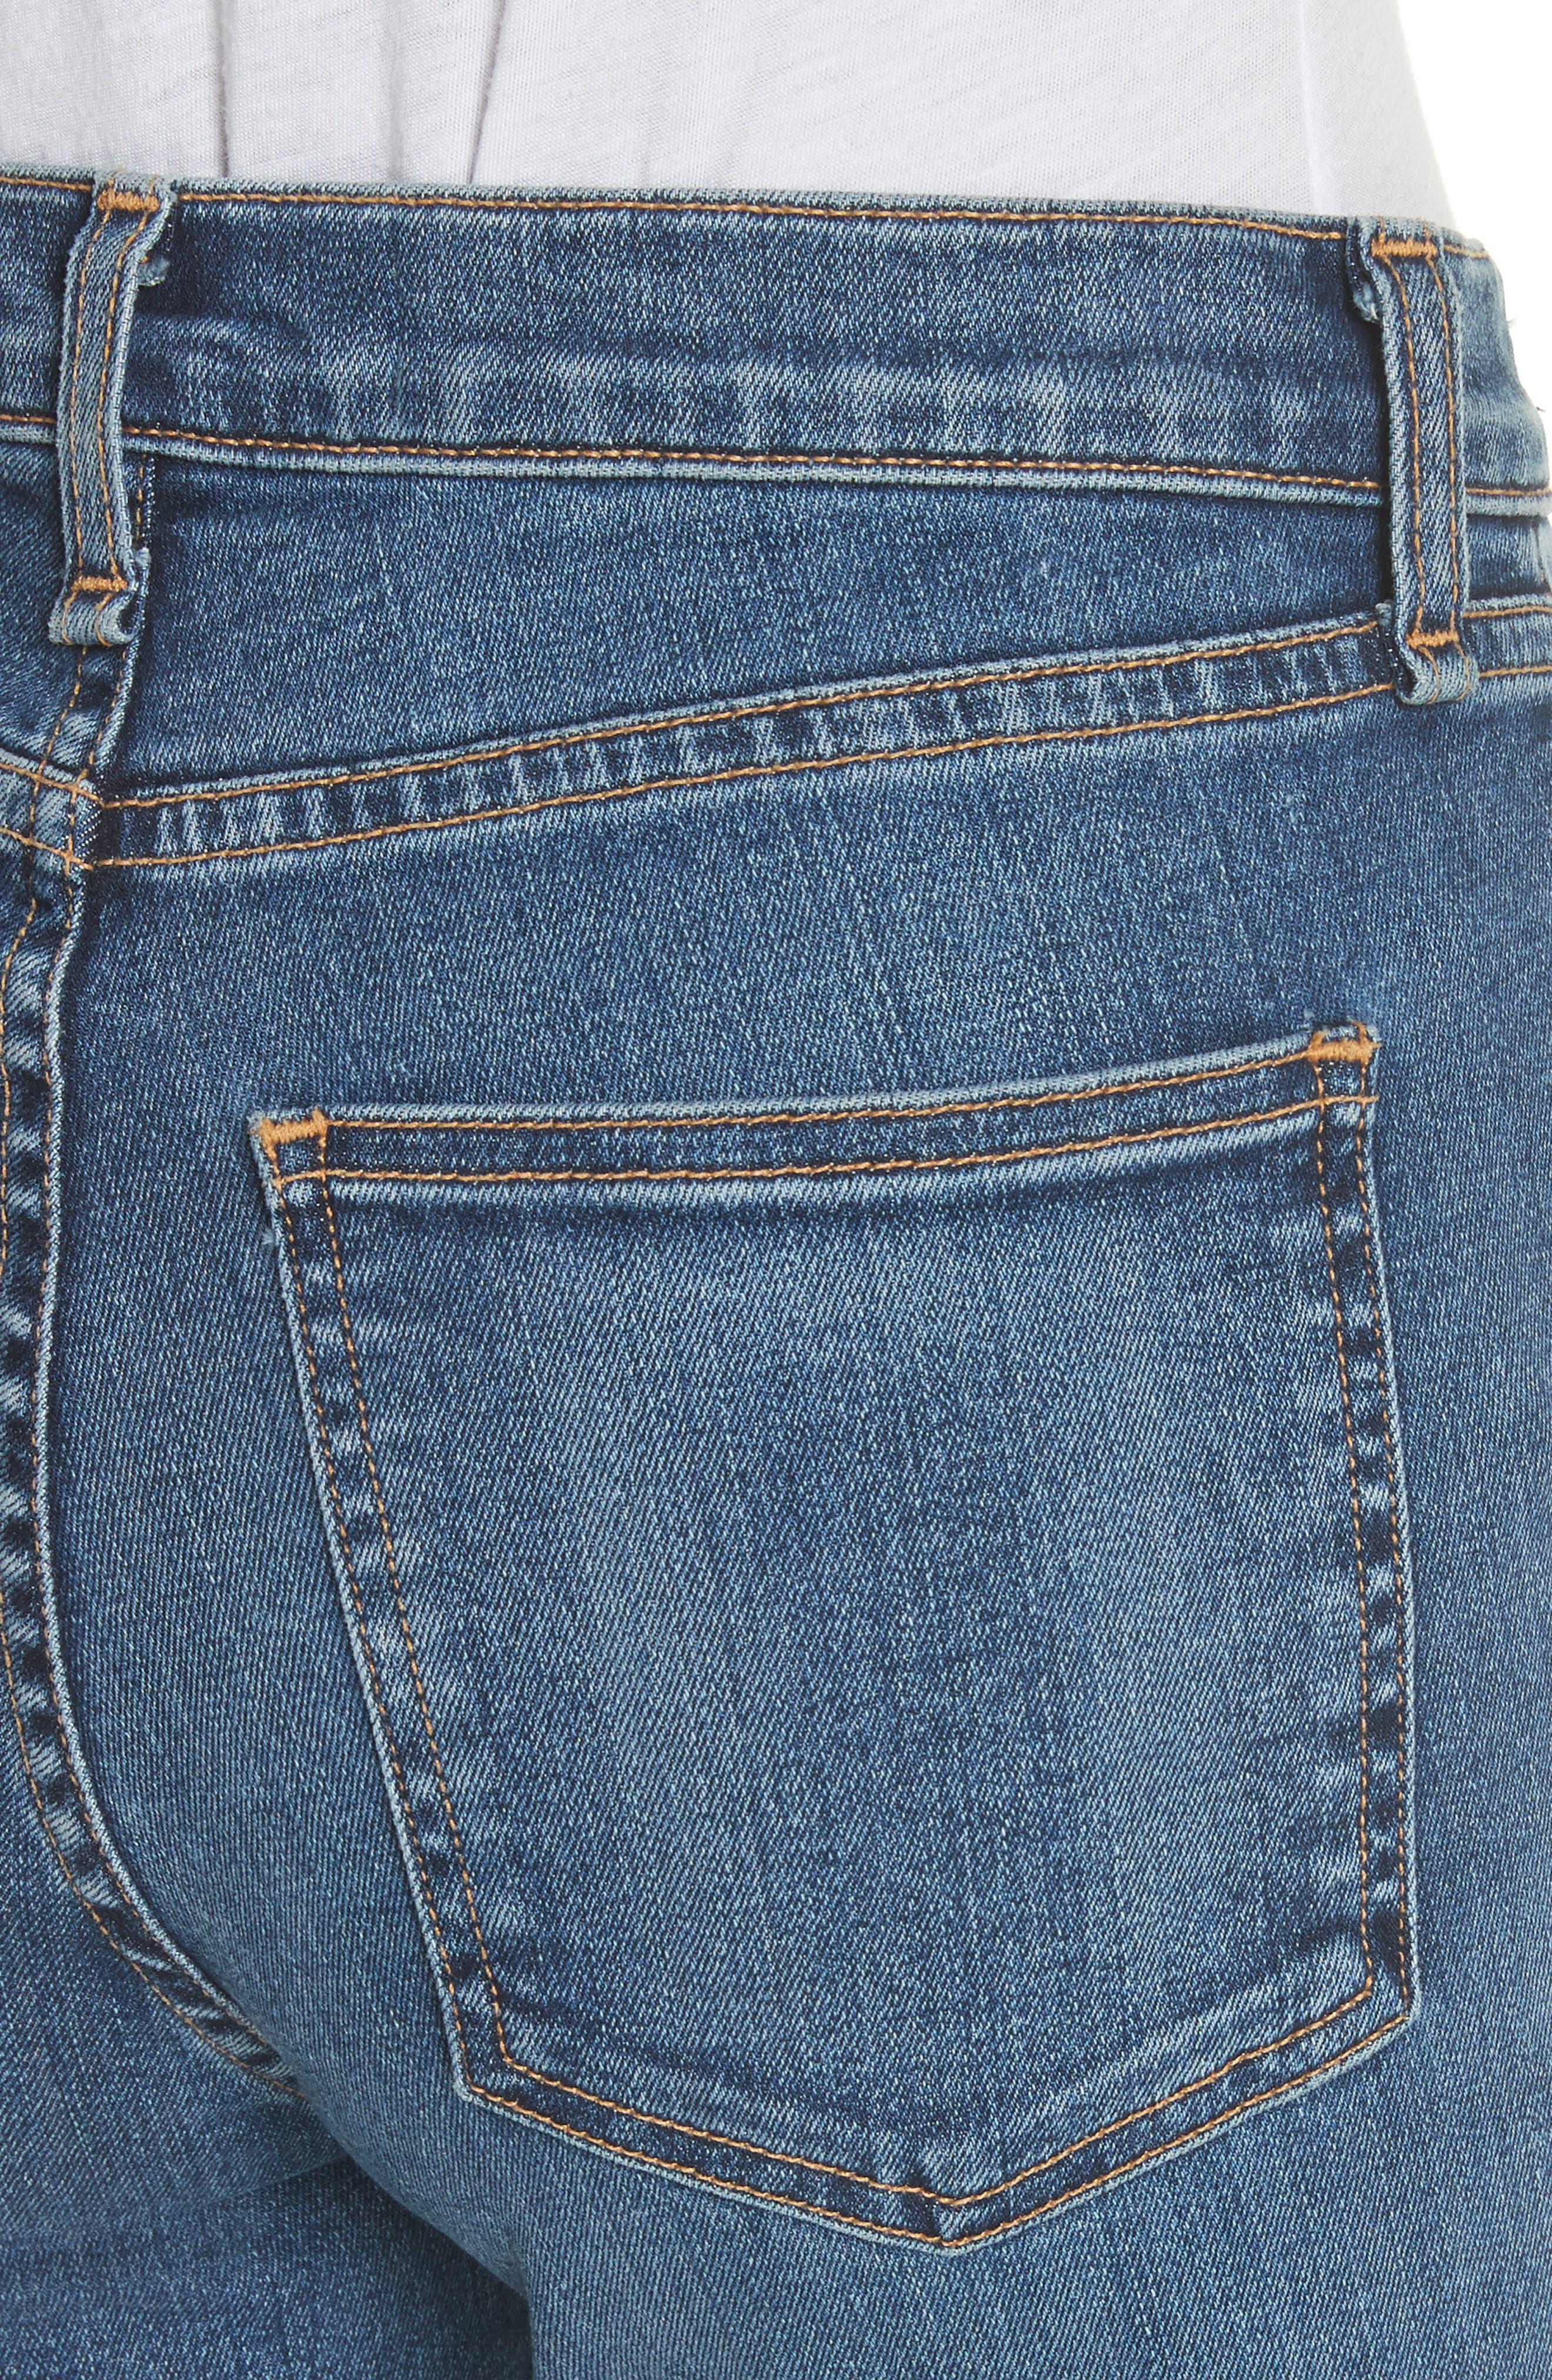 Kate Crop Skinny Jeans,                             Alternate thumbnail 4, color,                             400